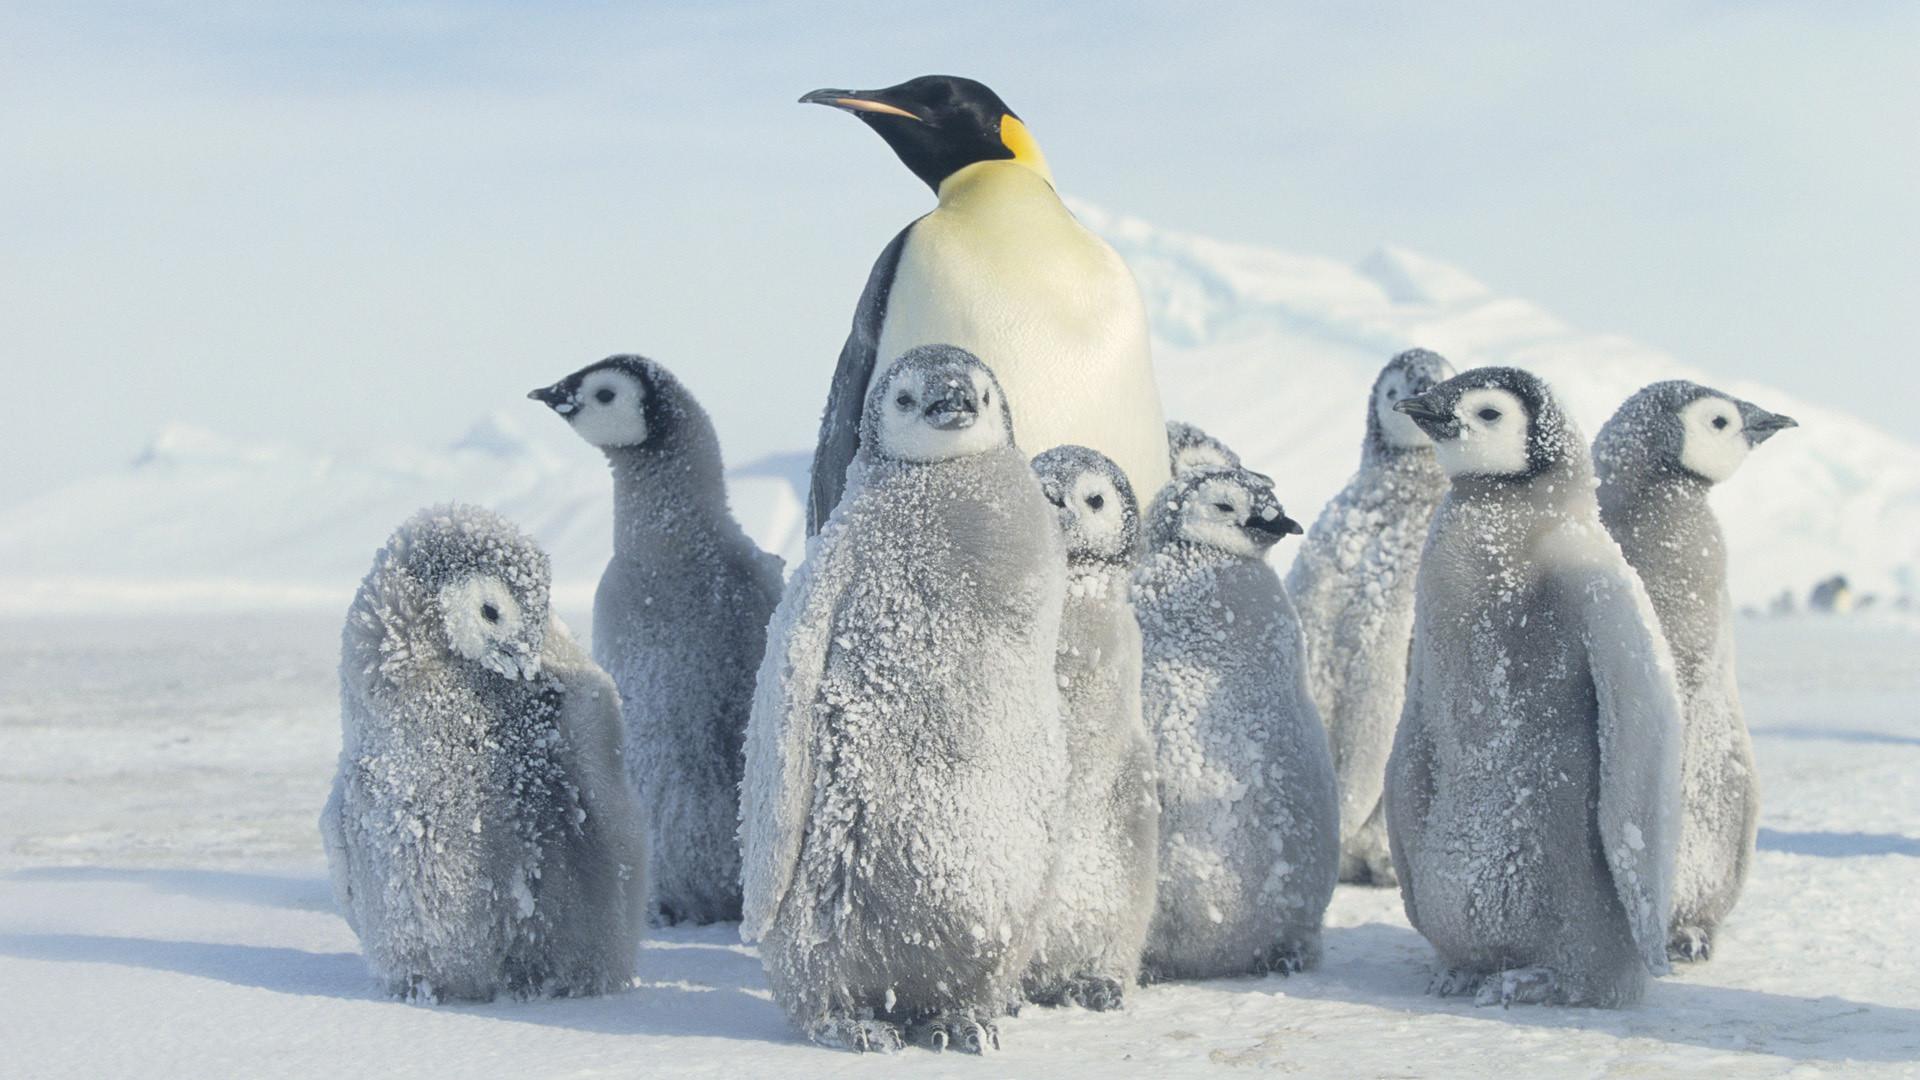 Penguin Wallpaper Fantastic Penguin Images K Ultra HD   HD Wallpapers    Pinterest   Wallpaper